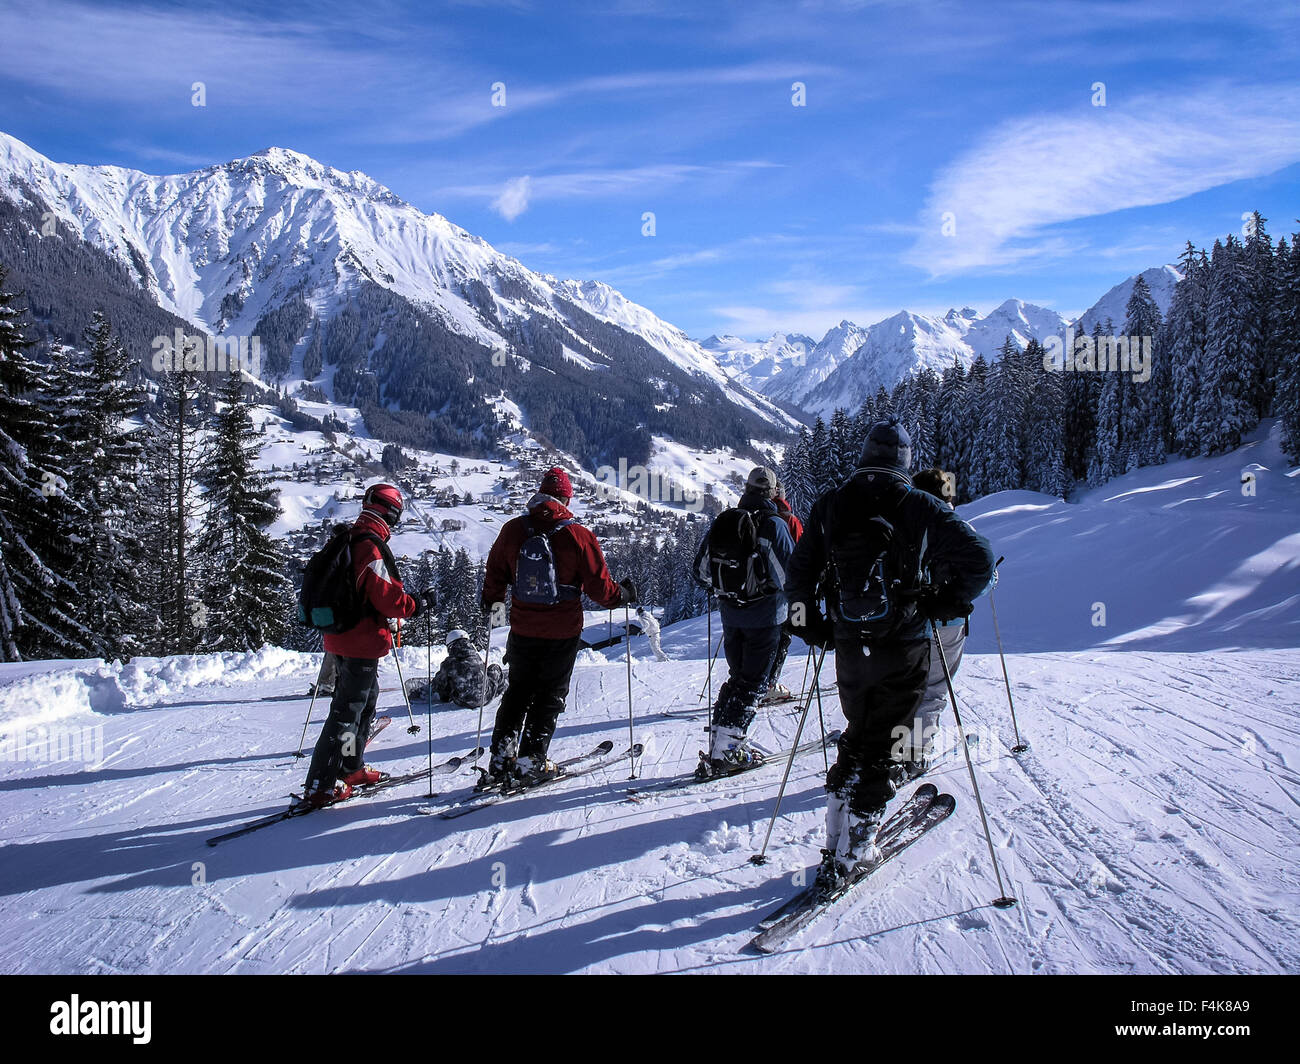 Skiing in Davos / Klosters resort, Switzerland Stock Photo